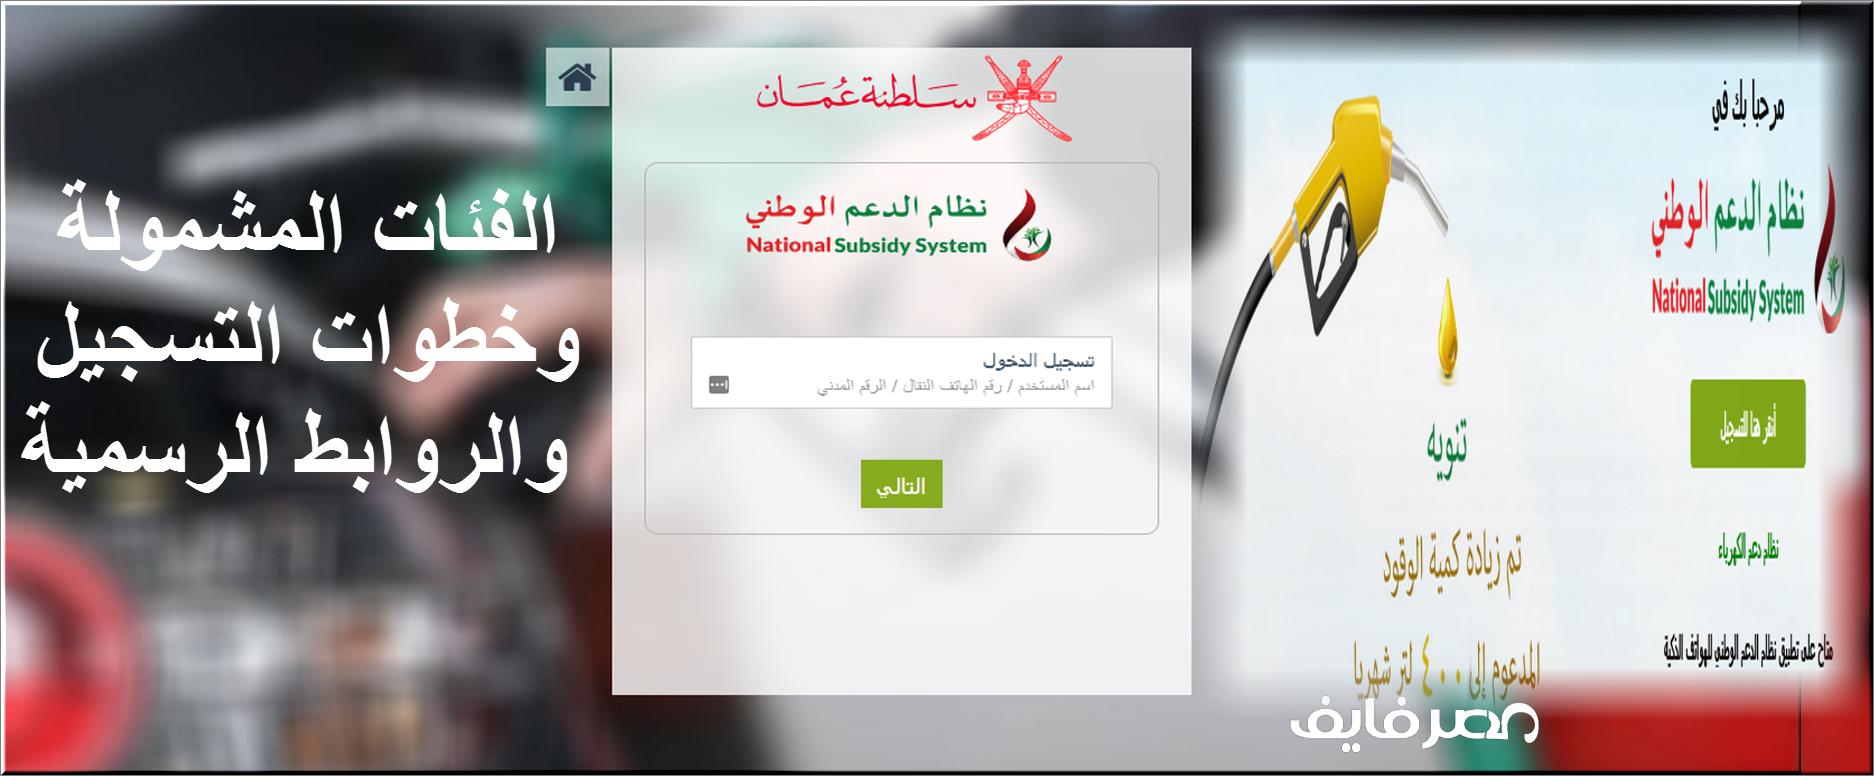 nss.gov.om نظام الدعم الوطني للكهرباء والمياه 2021 بسلطنة عمان وخطوات التسجيل والفئات المشمولة